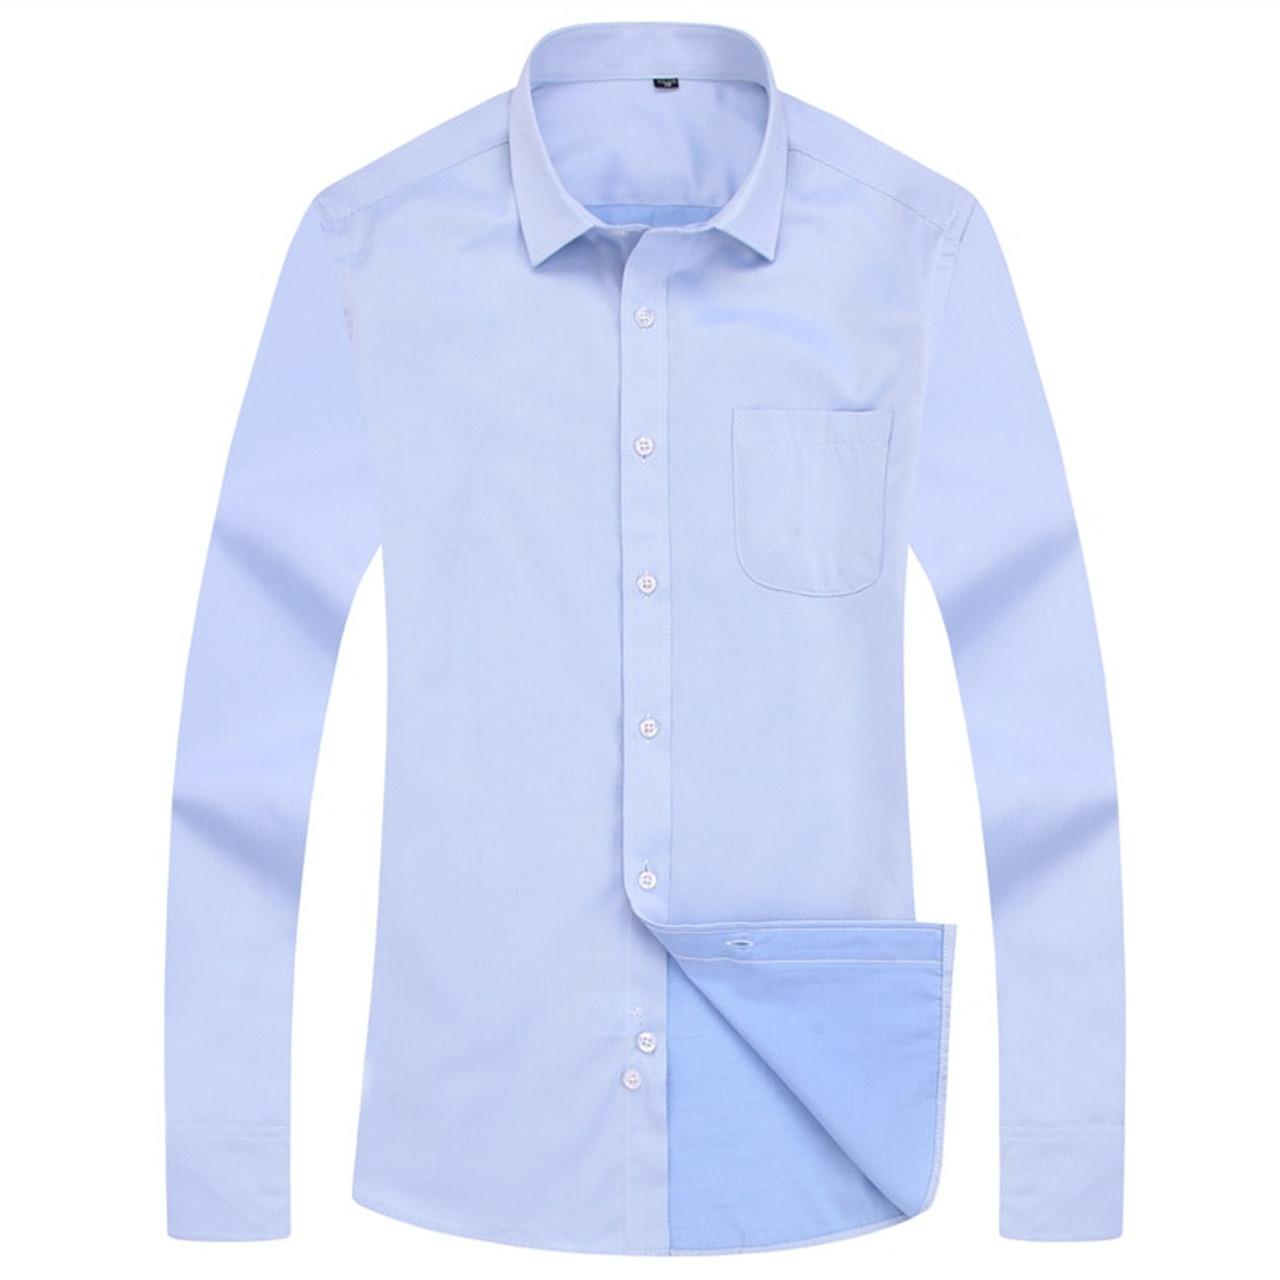 507c04295f2d9 4XL 5XL 6XL 7XL 8XL Large Size Men's Business Casual Long Sleeved Shirt  White Blue Black Smart Male Social Dress Shirt Plus